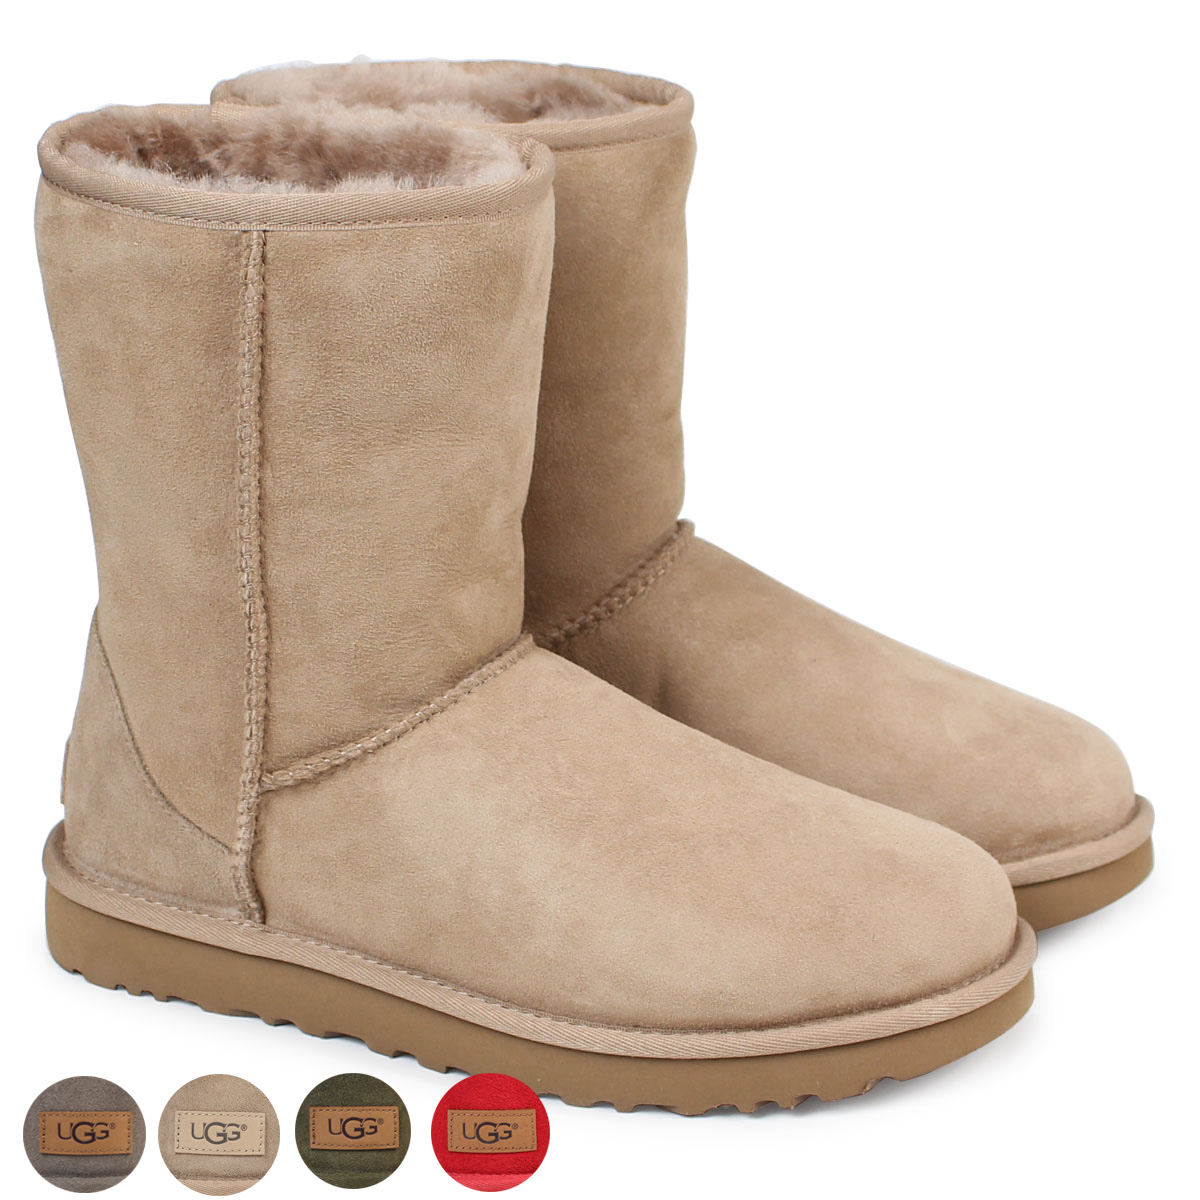 a3dbb05f8fc low cost ugg 5825 boots 9 west 78318 7c2cf